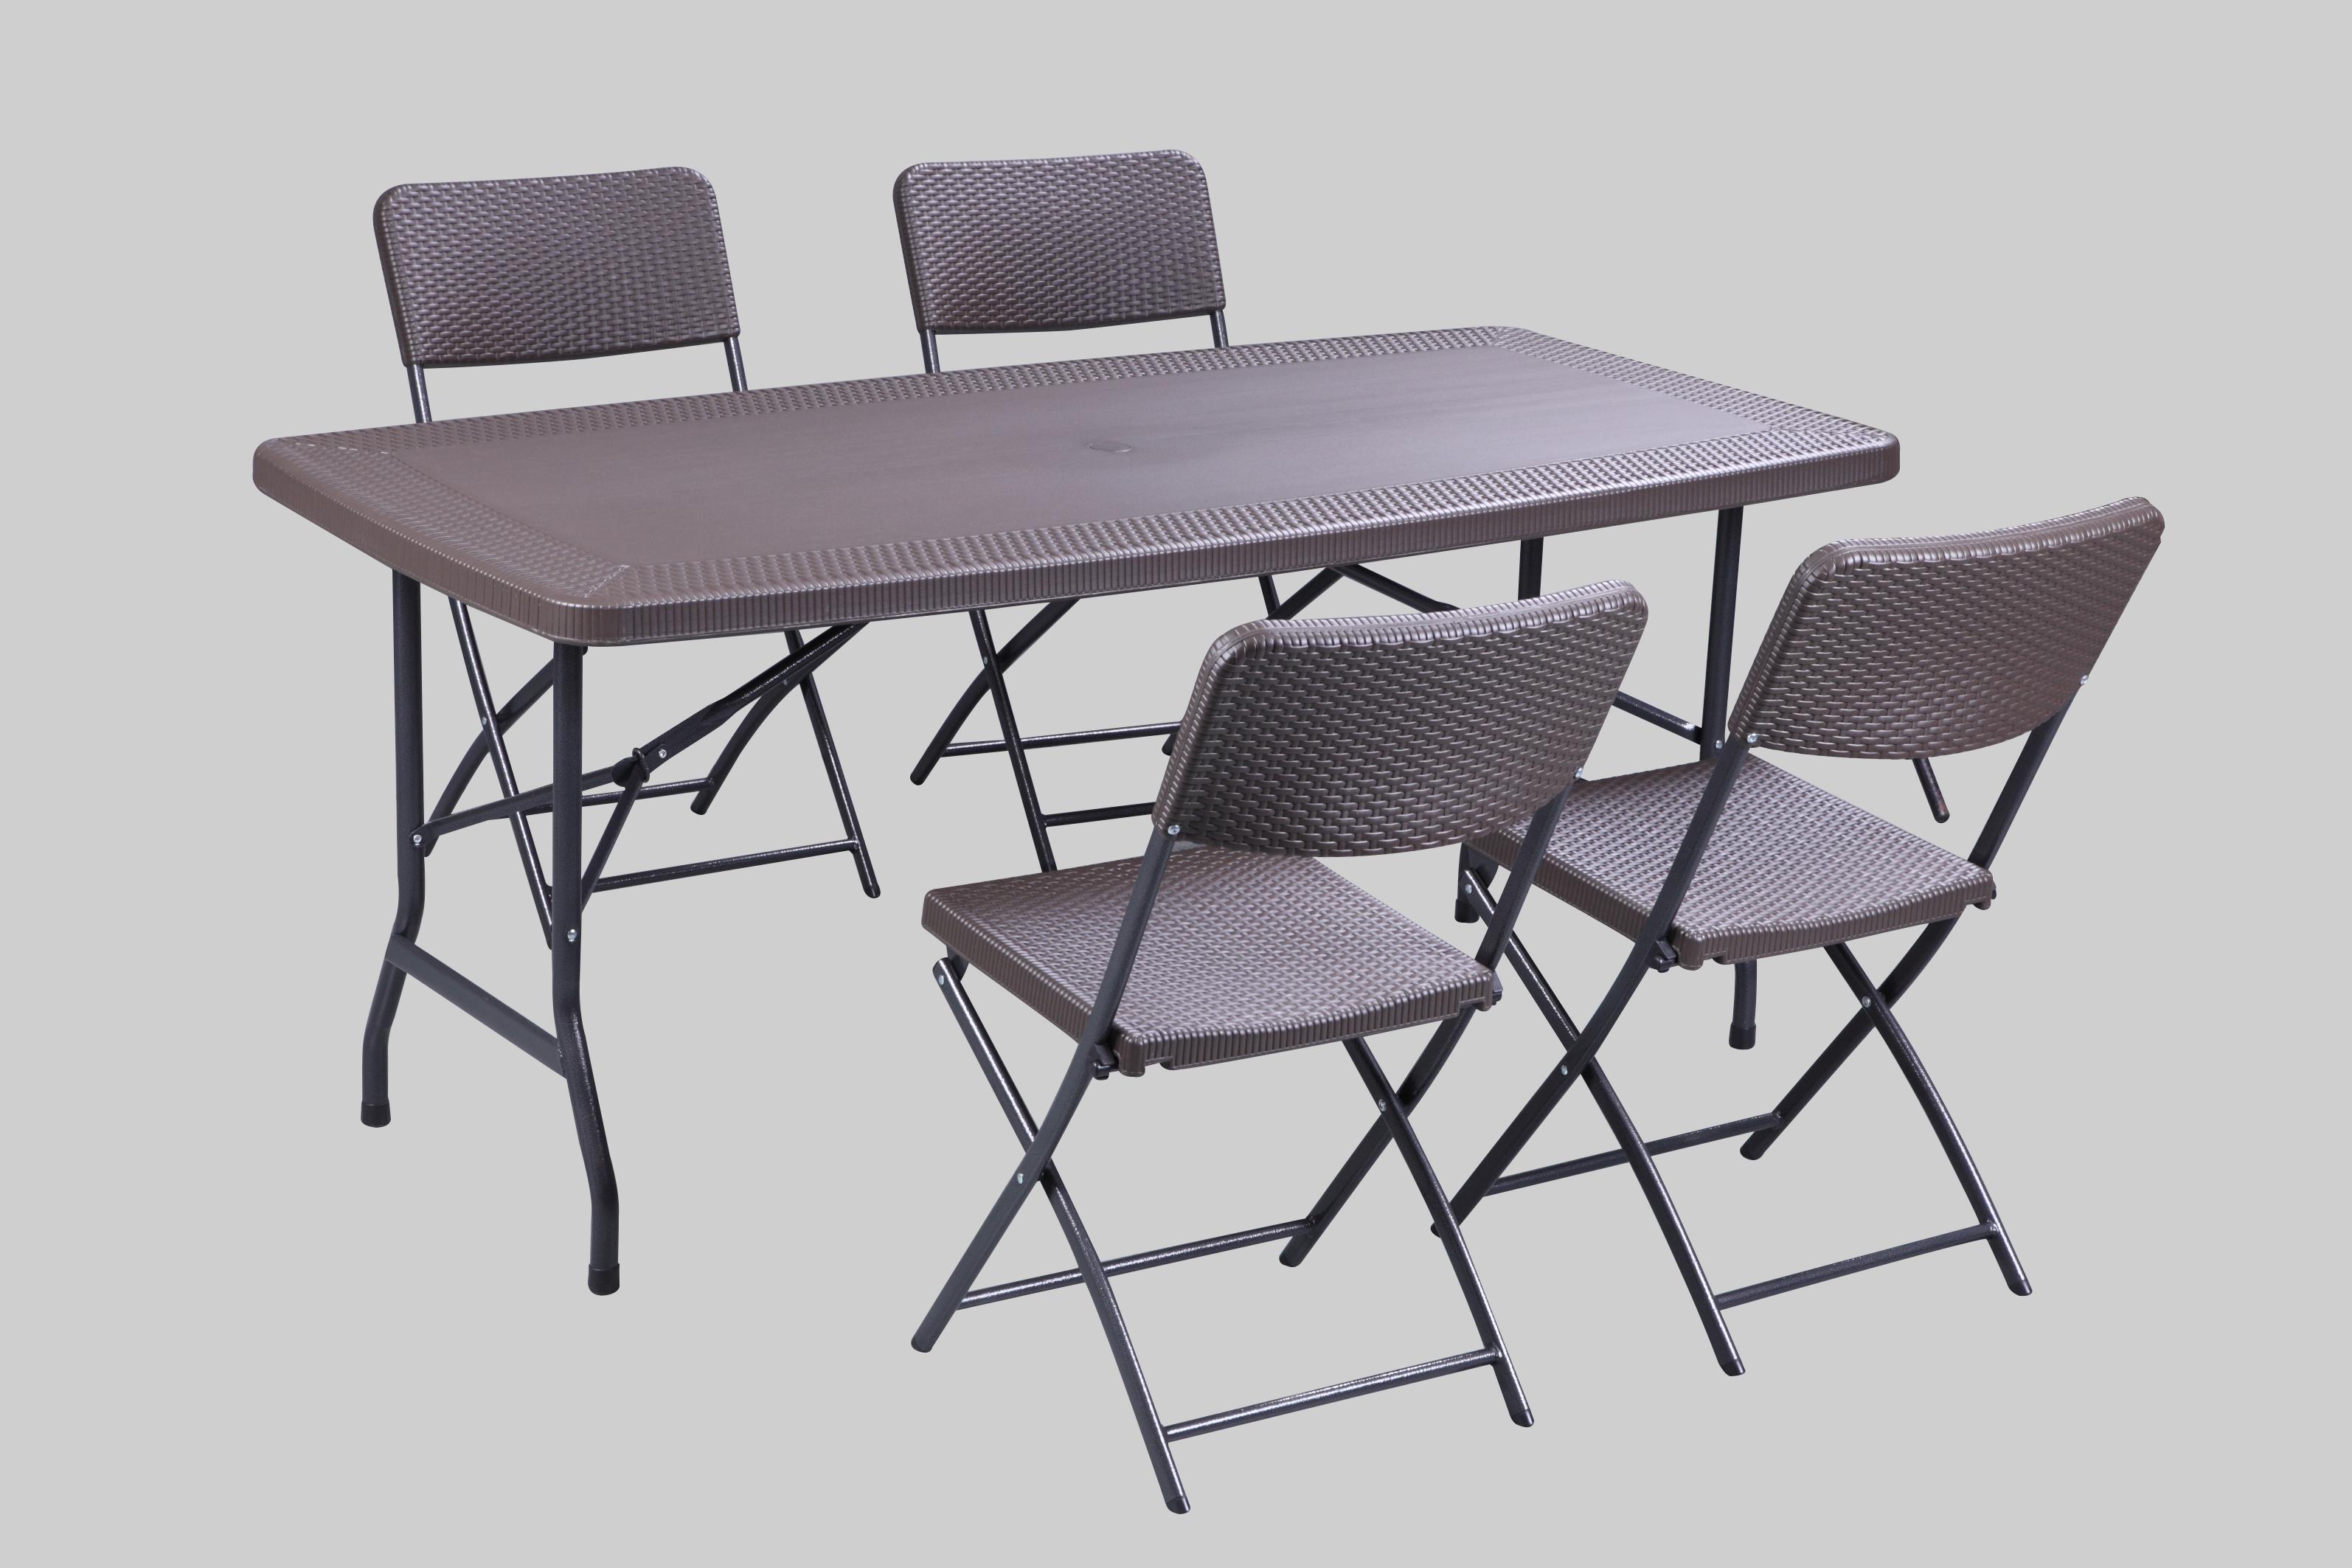 Folding Plastic Garden Lawn Chairs